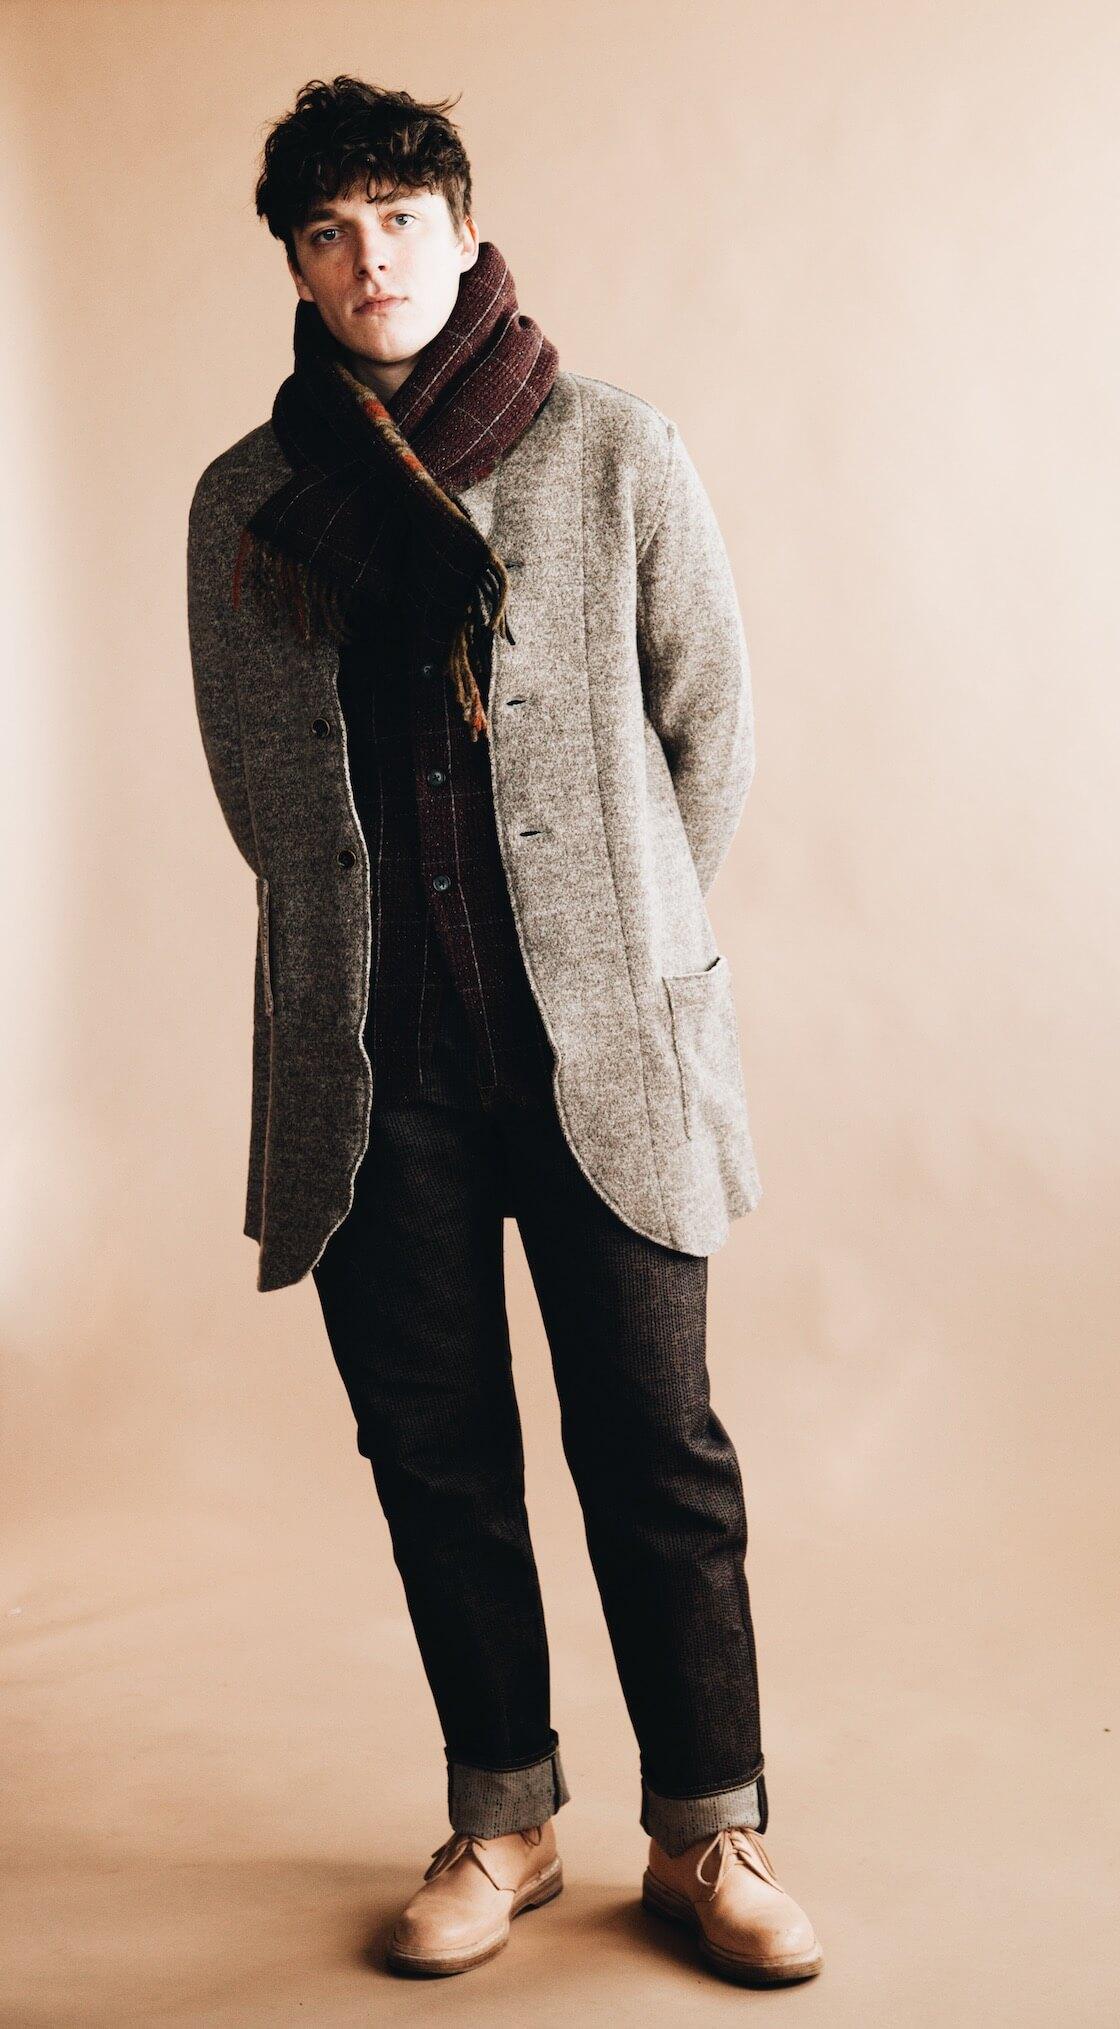 kapital tyrol wool nomad jacket, tweed fleecy knit kobe jacket, century denim pants, country wool scarf, and hender scheme mip 21 shoes on body